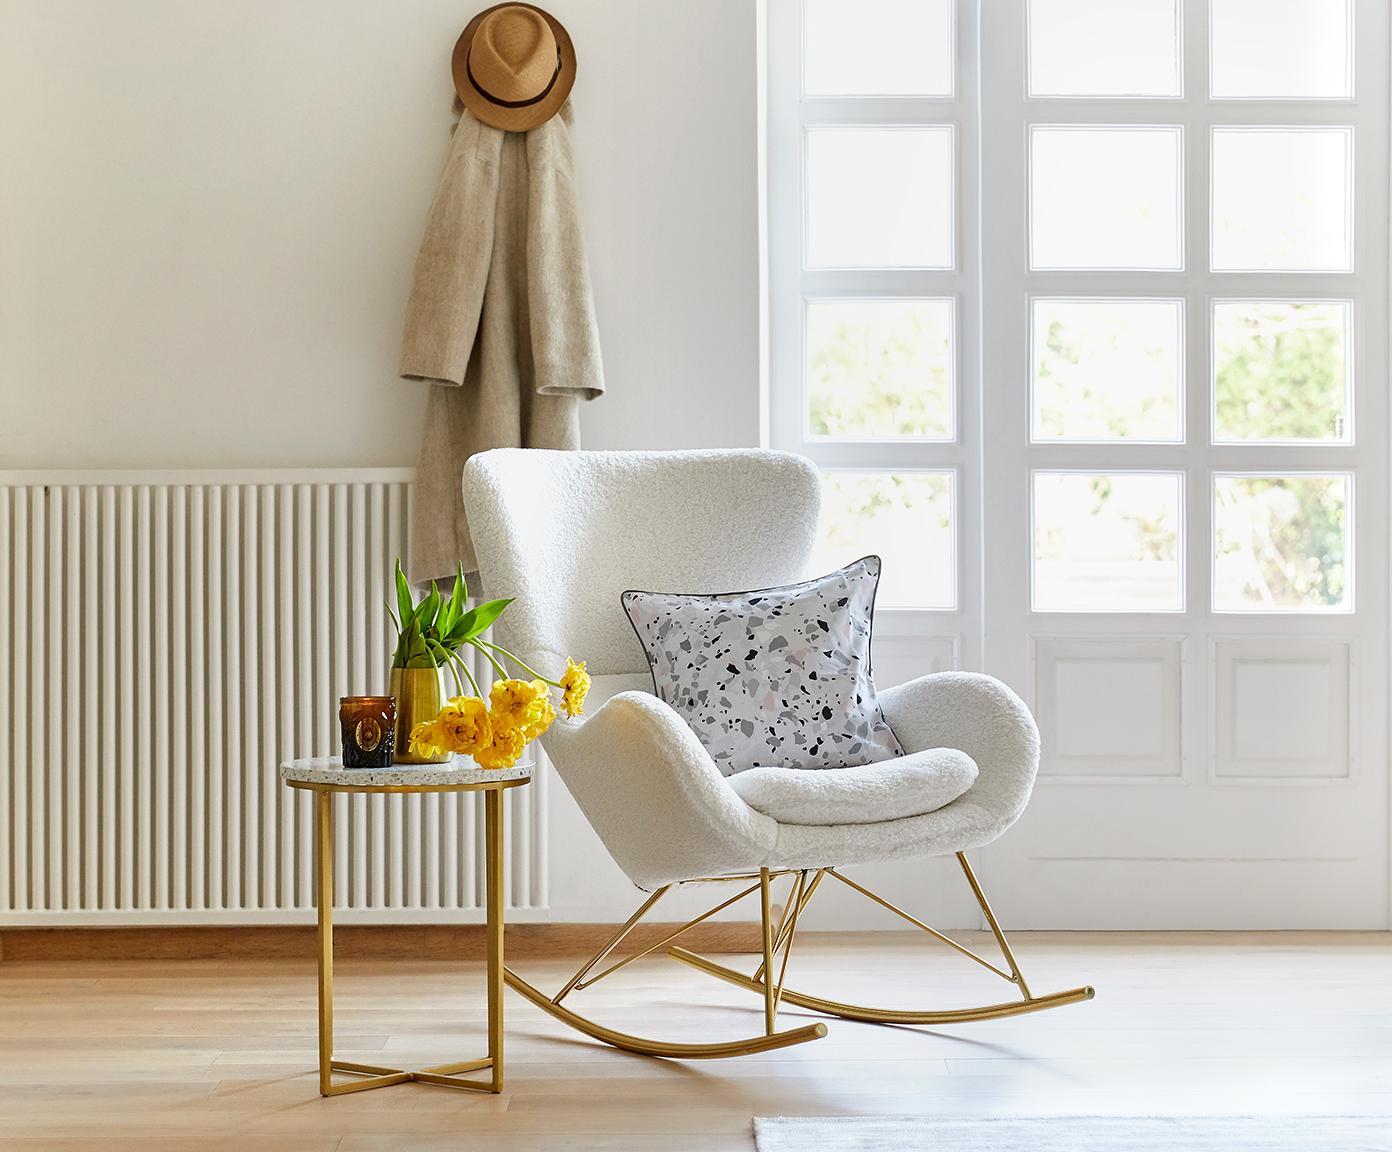 Mecedora de borreguilloWing, Tapizado: poliéster (borreguillo), Estructura: metal brillante, Tejido blanco crema, An 77 x F 96 cm